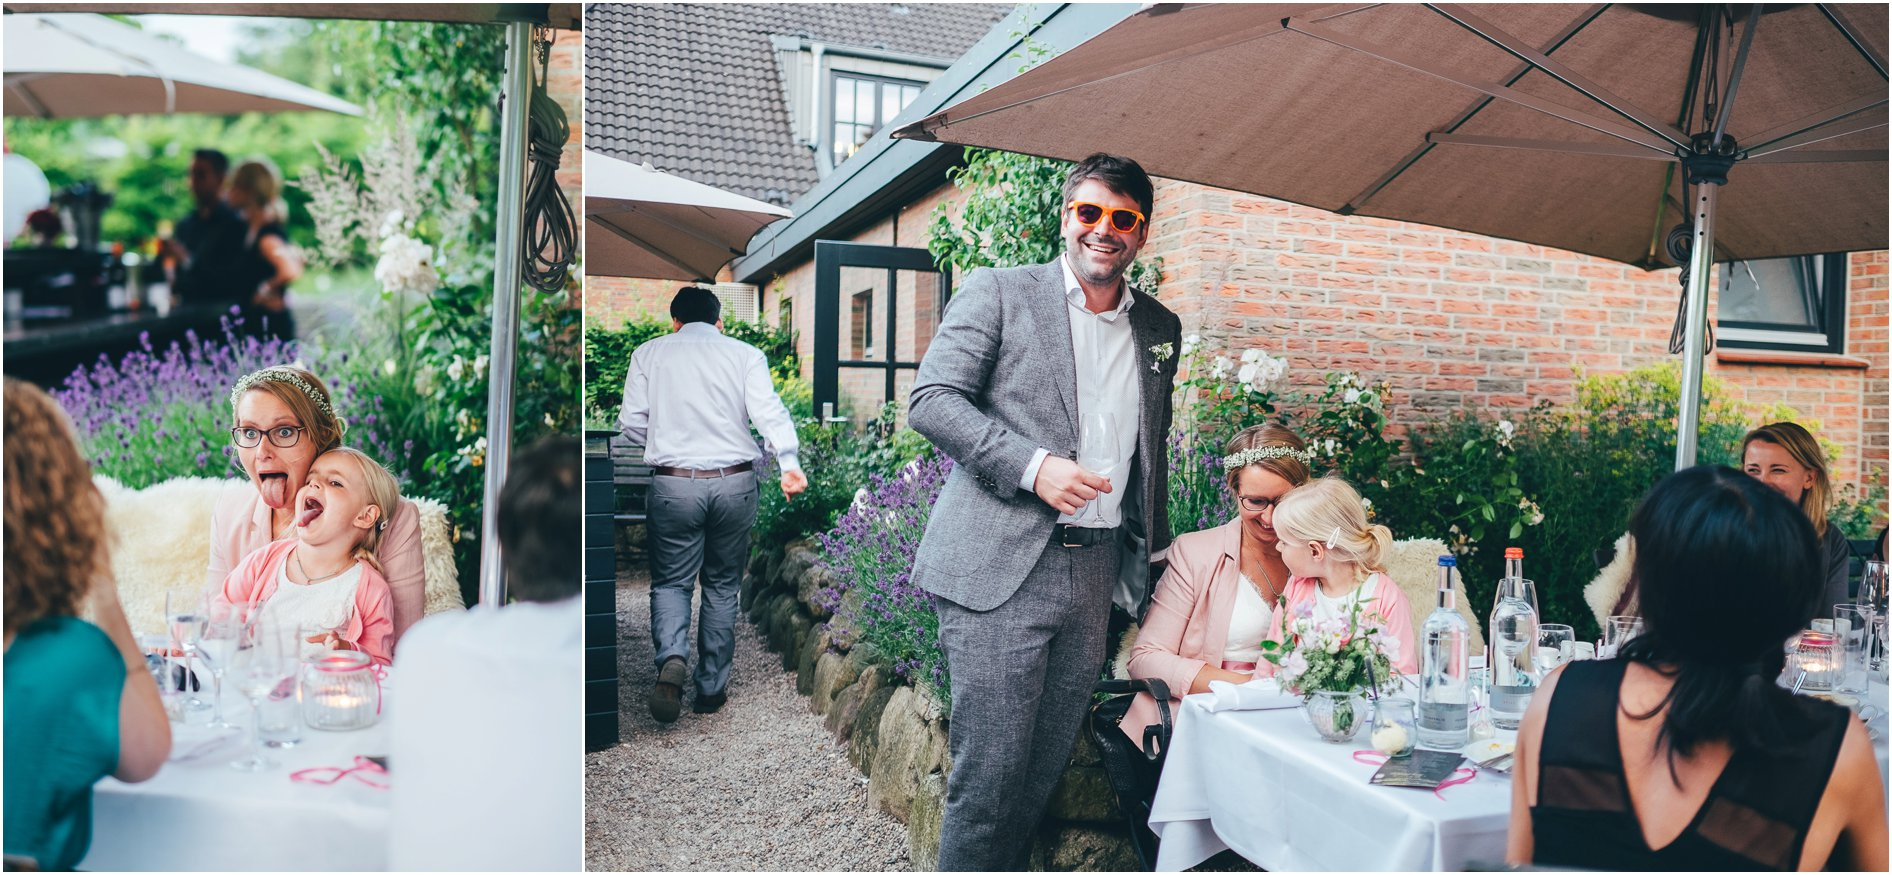 2016-04-19_0096 Sandra & Janis - Hochzeitsfotograf in Seevetal